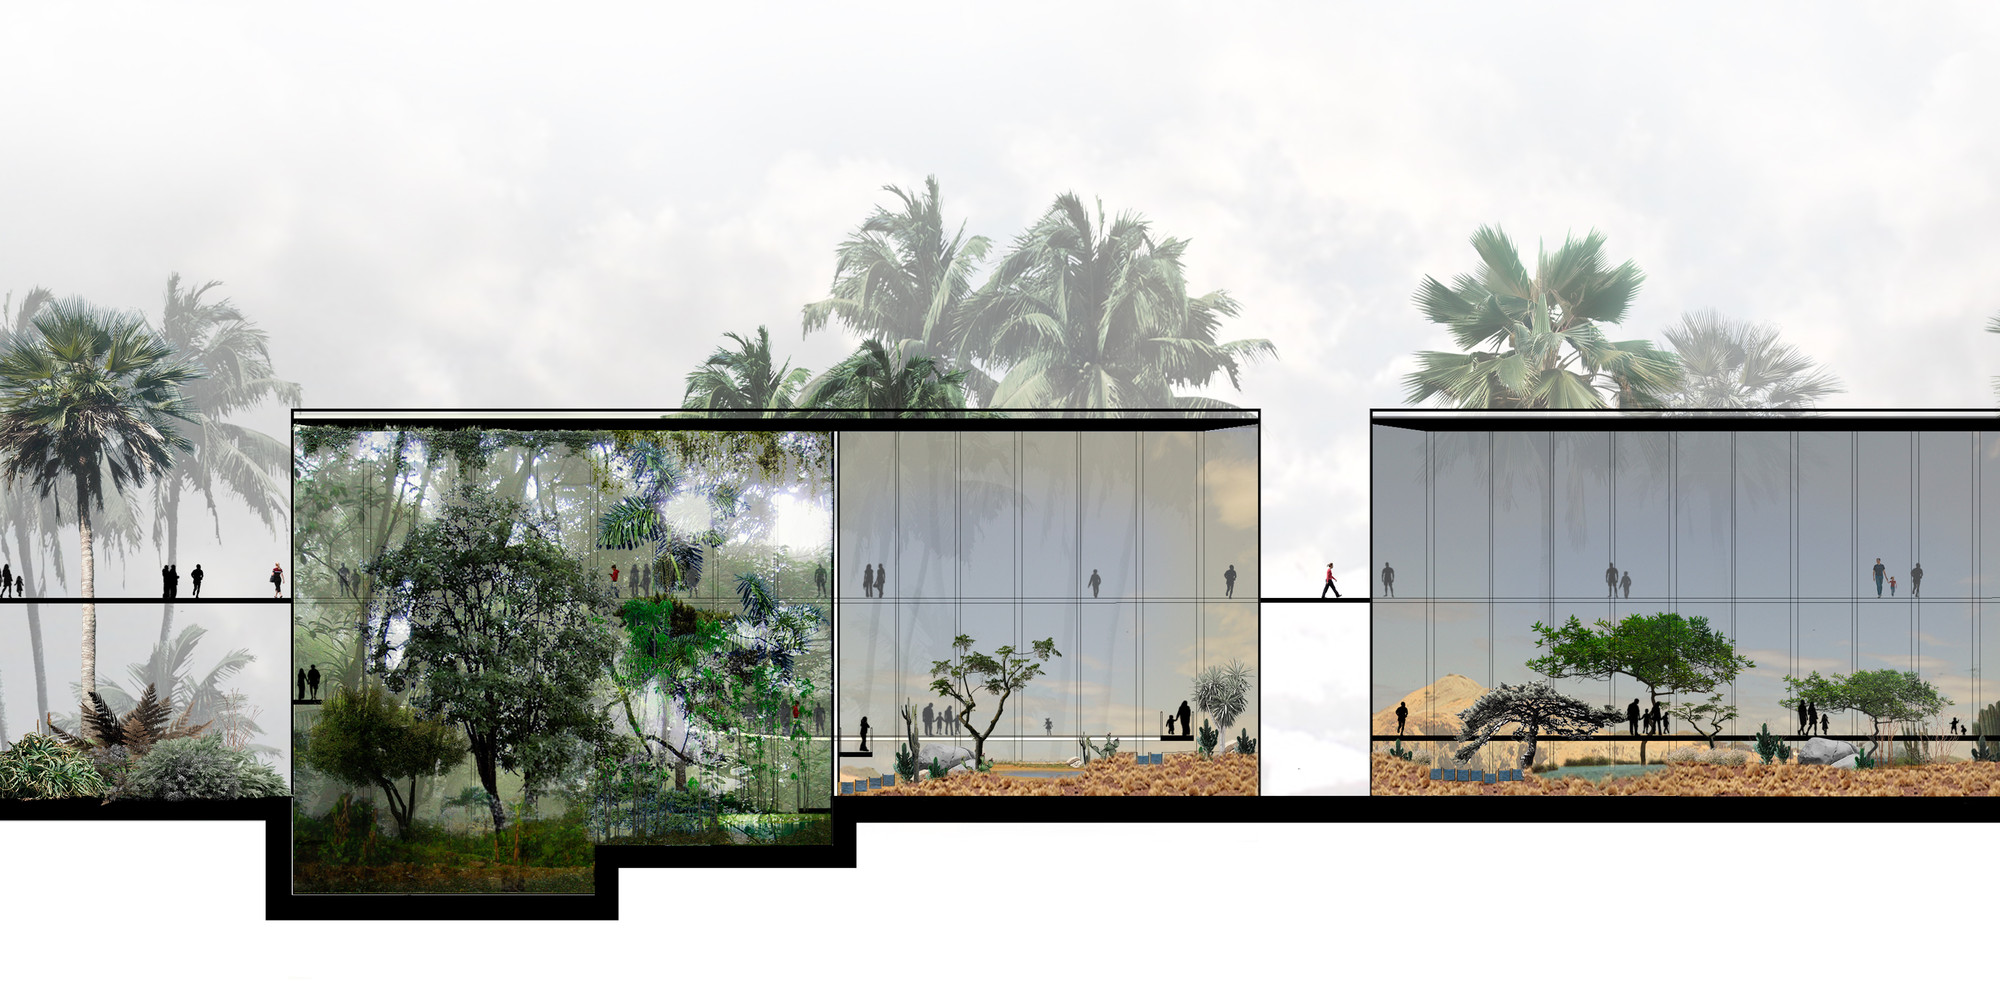 Galer a de segundo lugar en concurso p blico para el for Centro de eventos jardin botanico